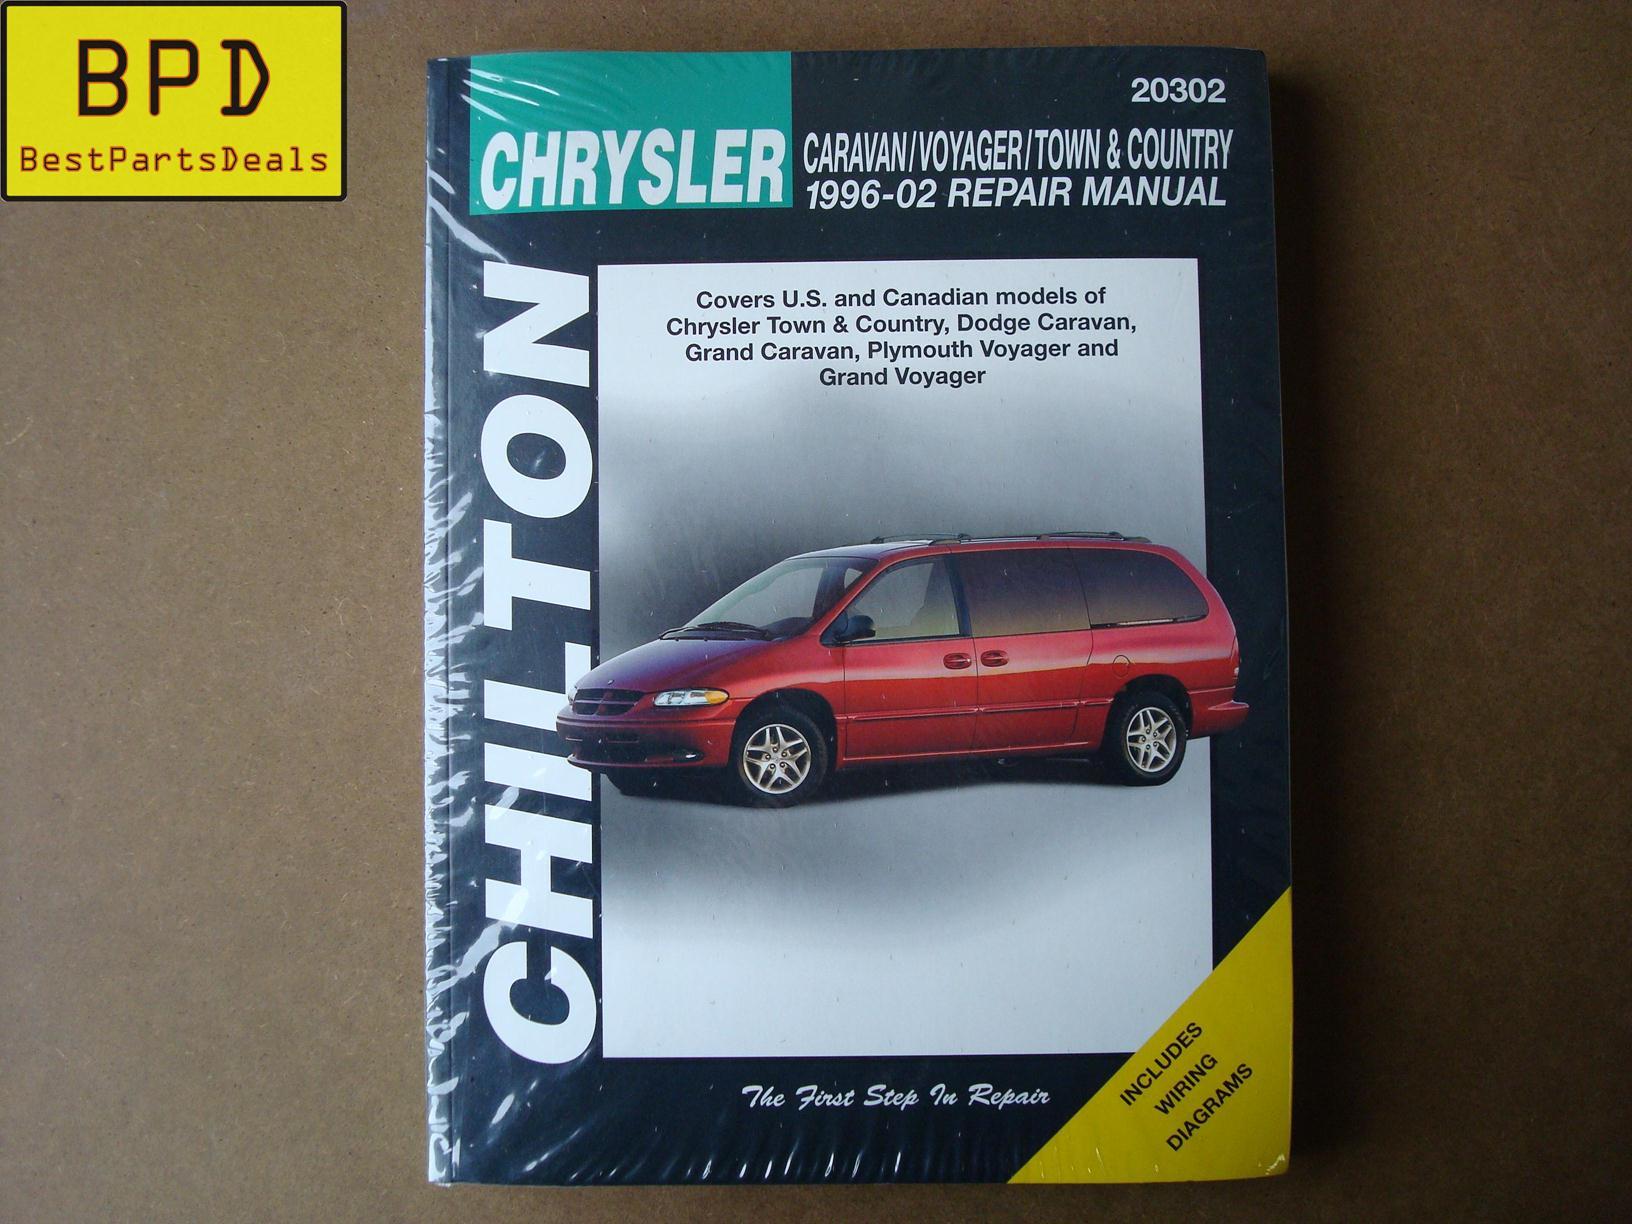 96 Plymouth Voyager Manual Wiring Diagram For 95 Chilton 02 Chrysler Caravan Town Country Repair Rh Ebay Com 92